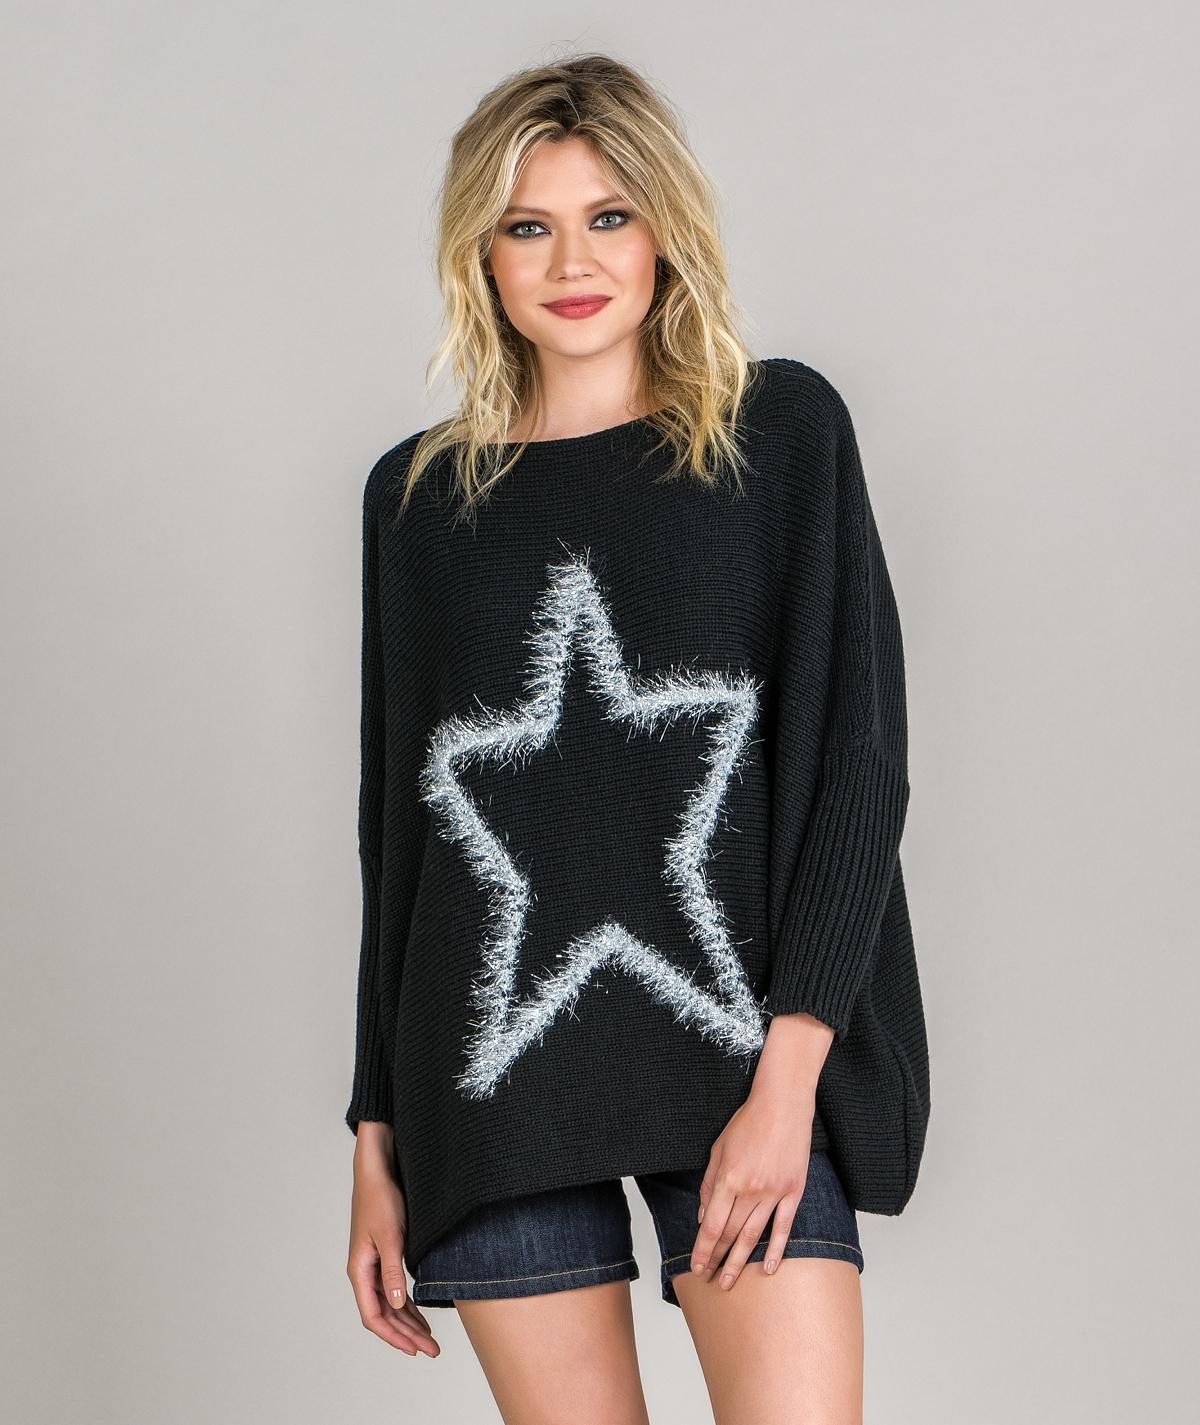 Camisola motivo estrela